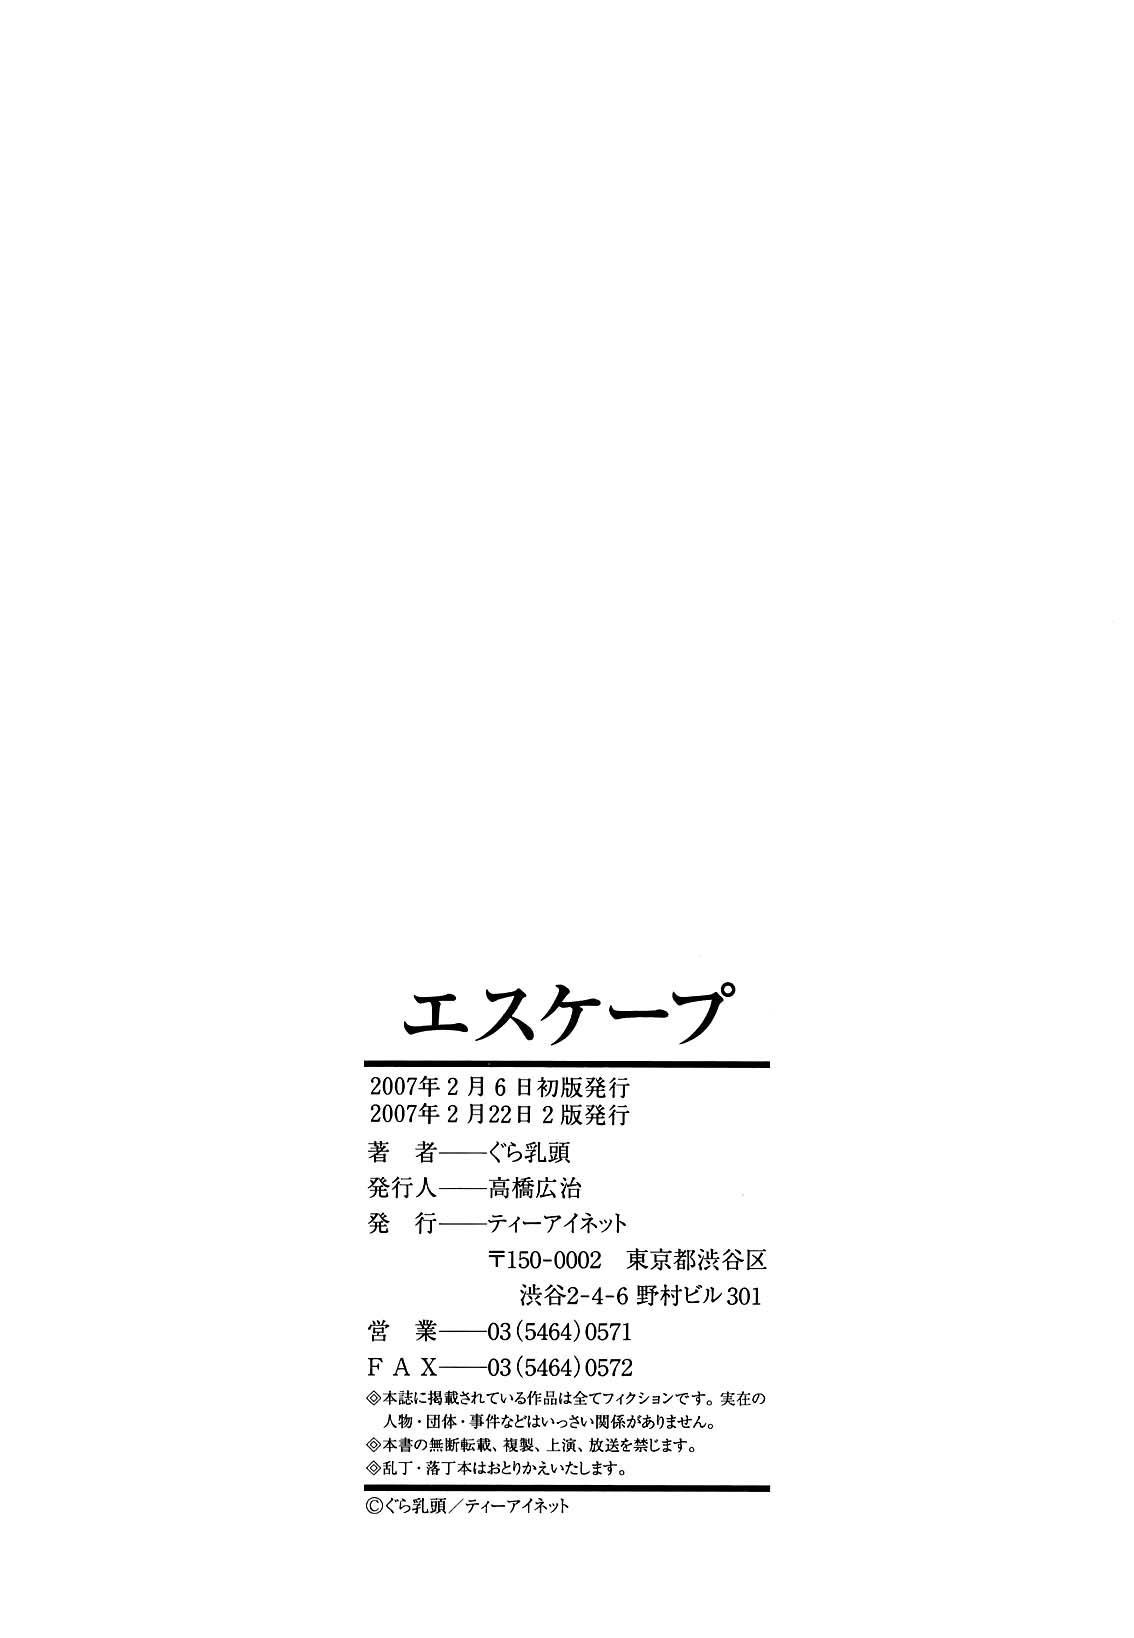 Gura Nyuutou - Escape chapter 7 35